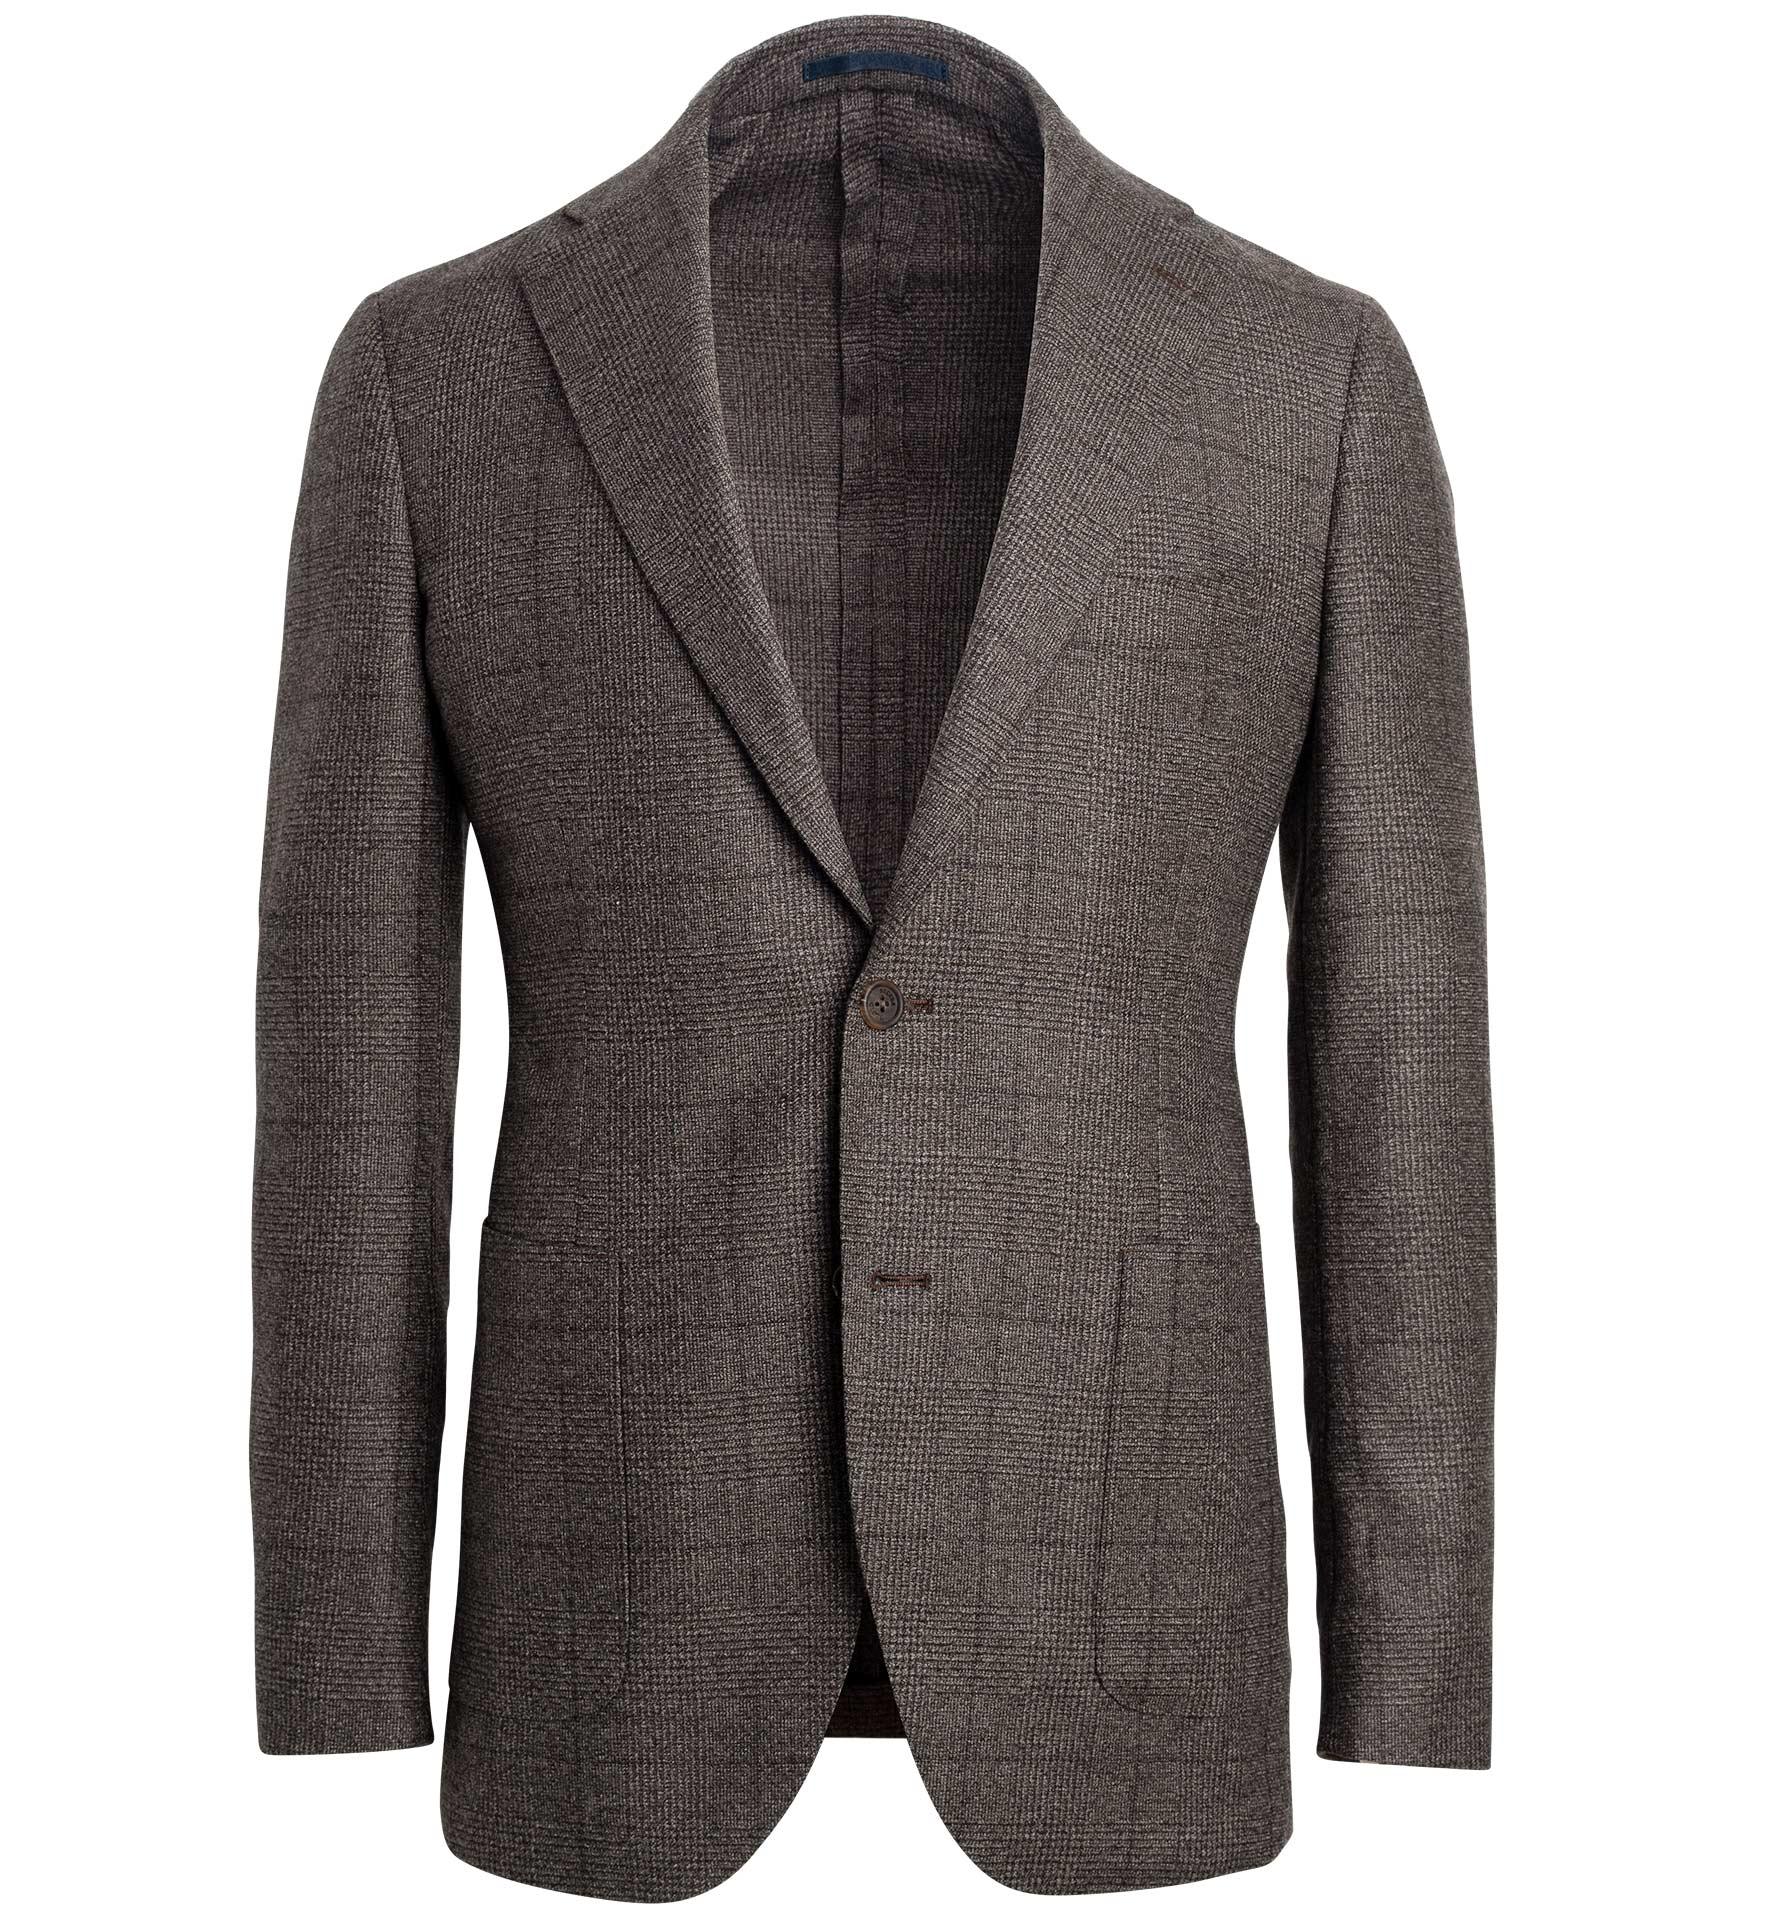 Zoom Image of Bedford Mocha Melange Prince of Wales Wool Jacket